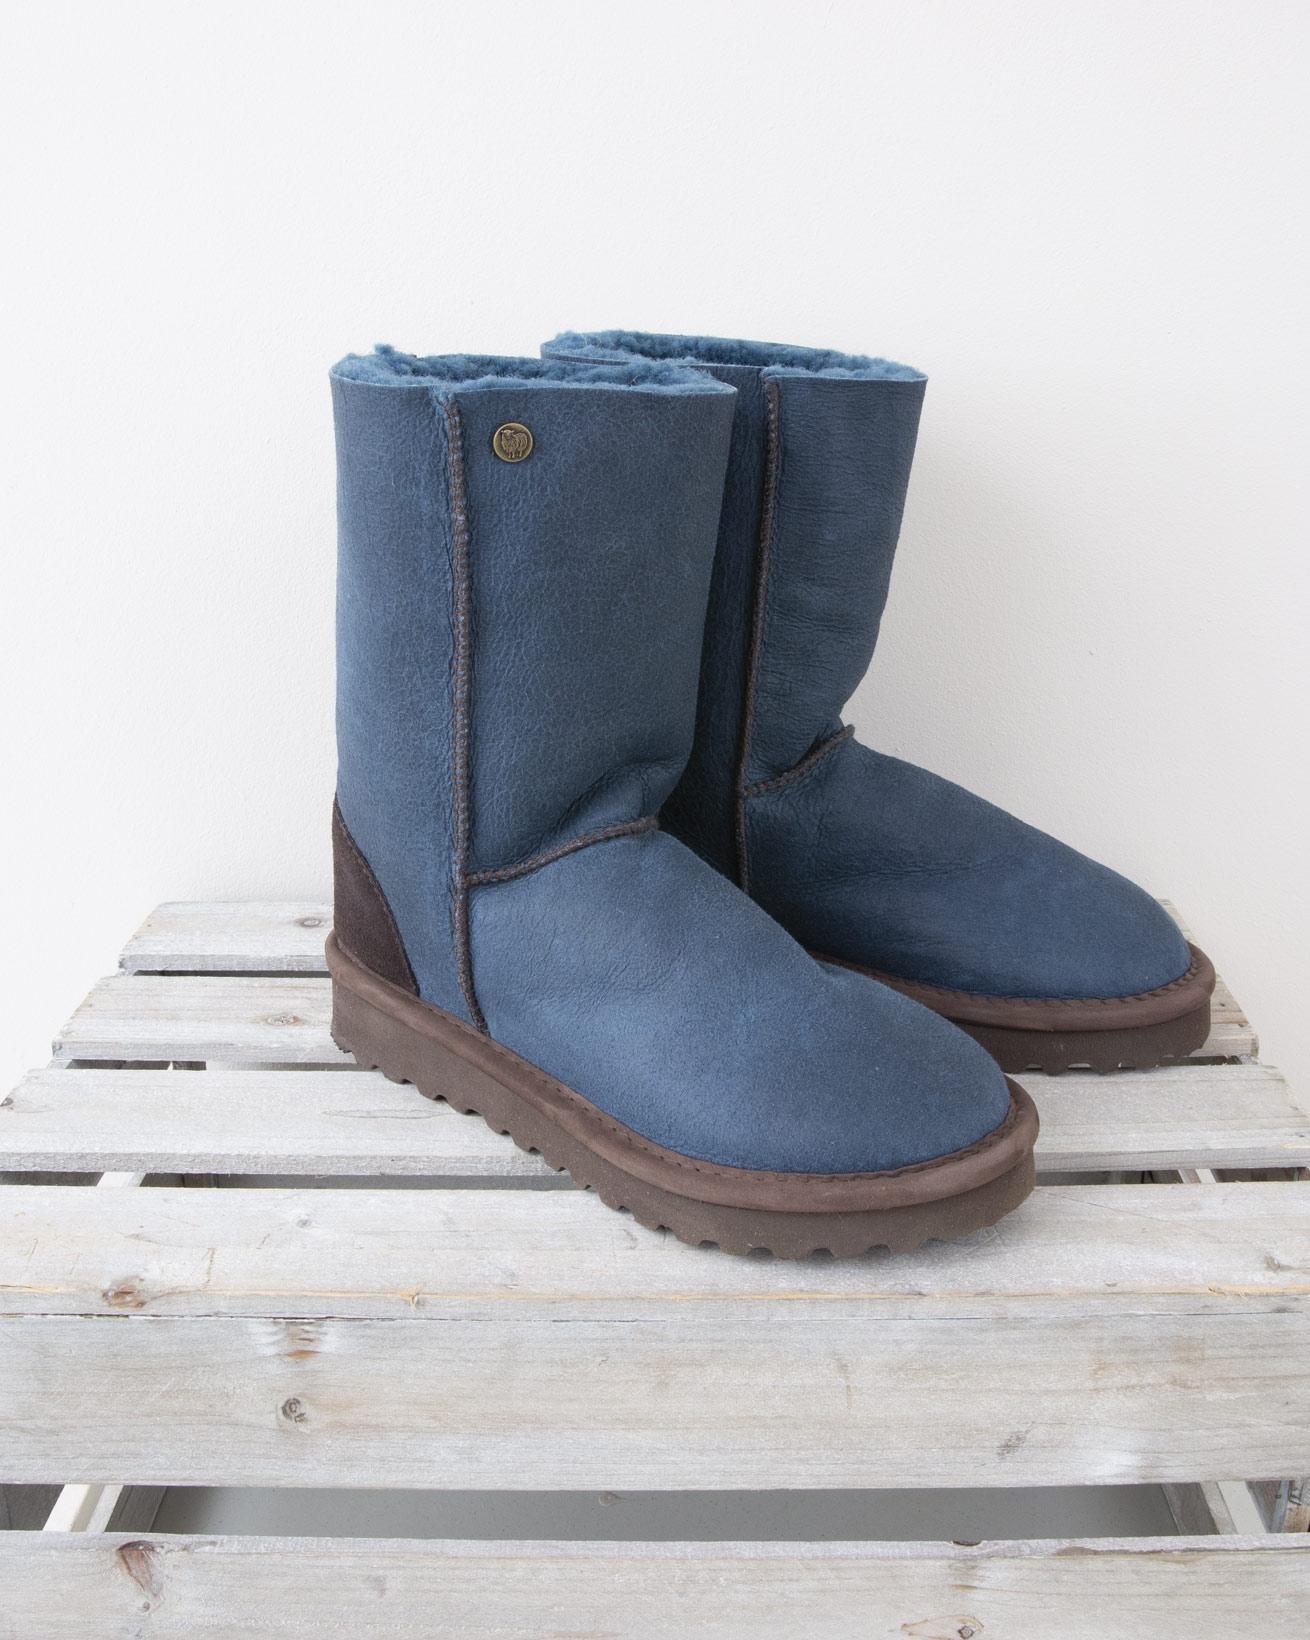 Celt Boot Reg - Size 6 - Icelandic Blue Nappa finish - 1352